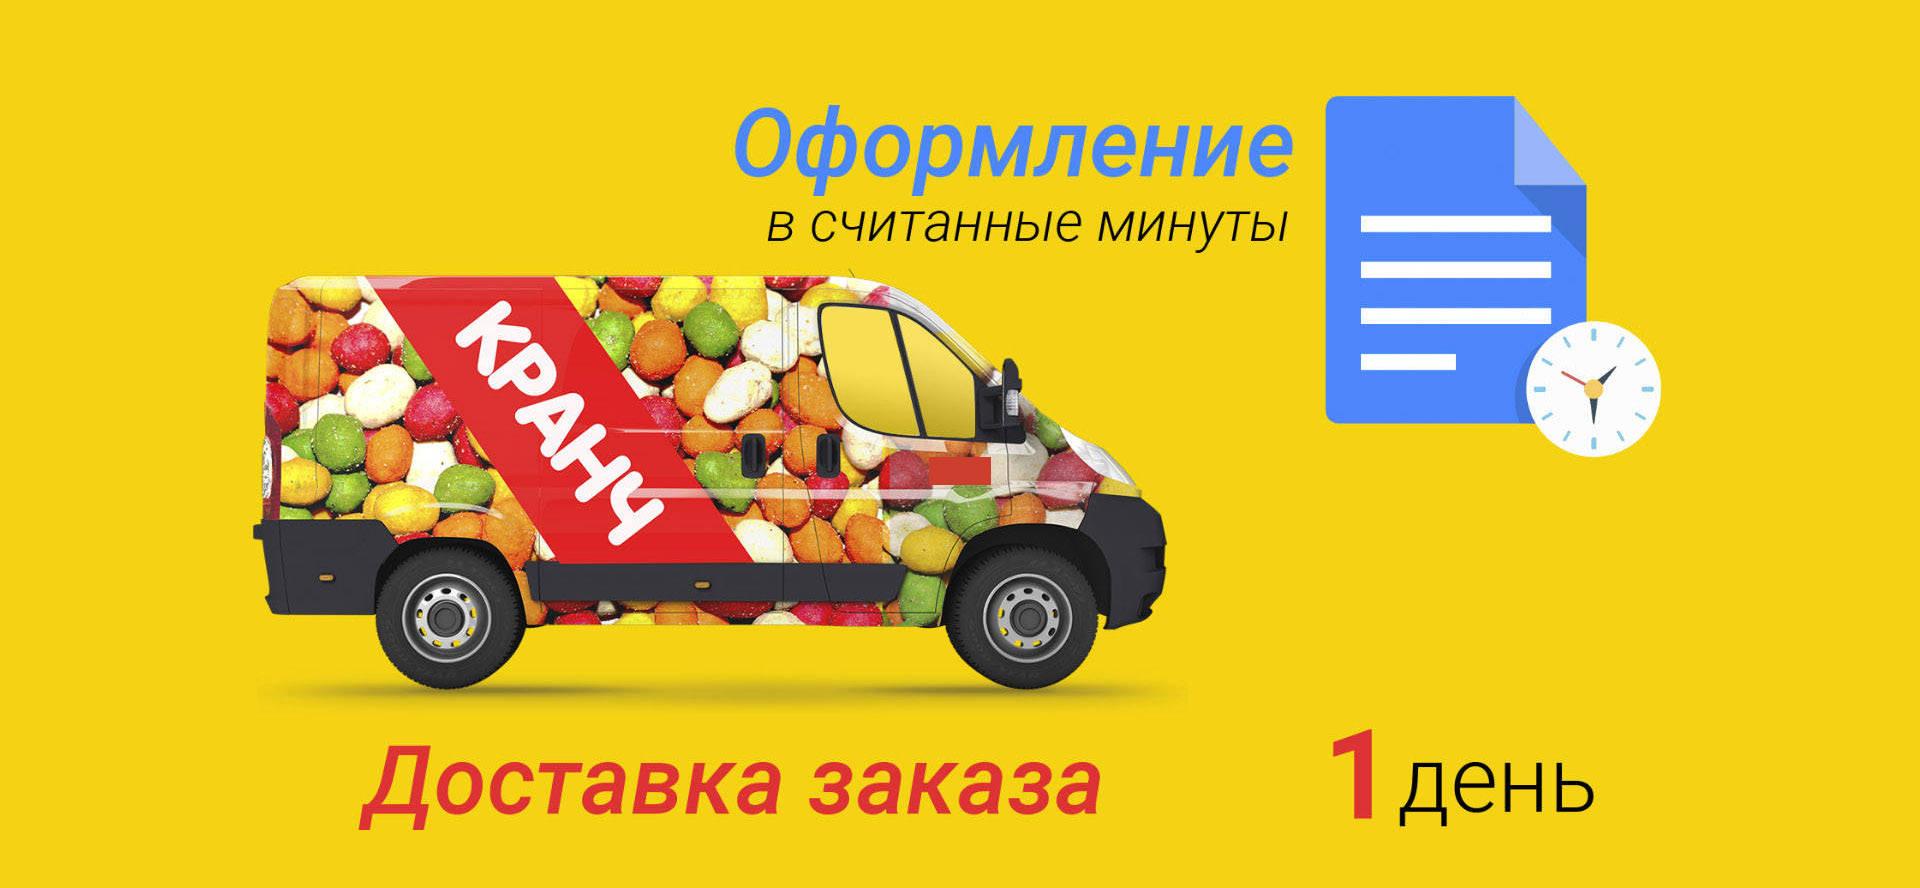 Development дизайна of the website снеков, Snacks web design development